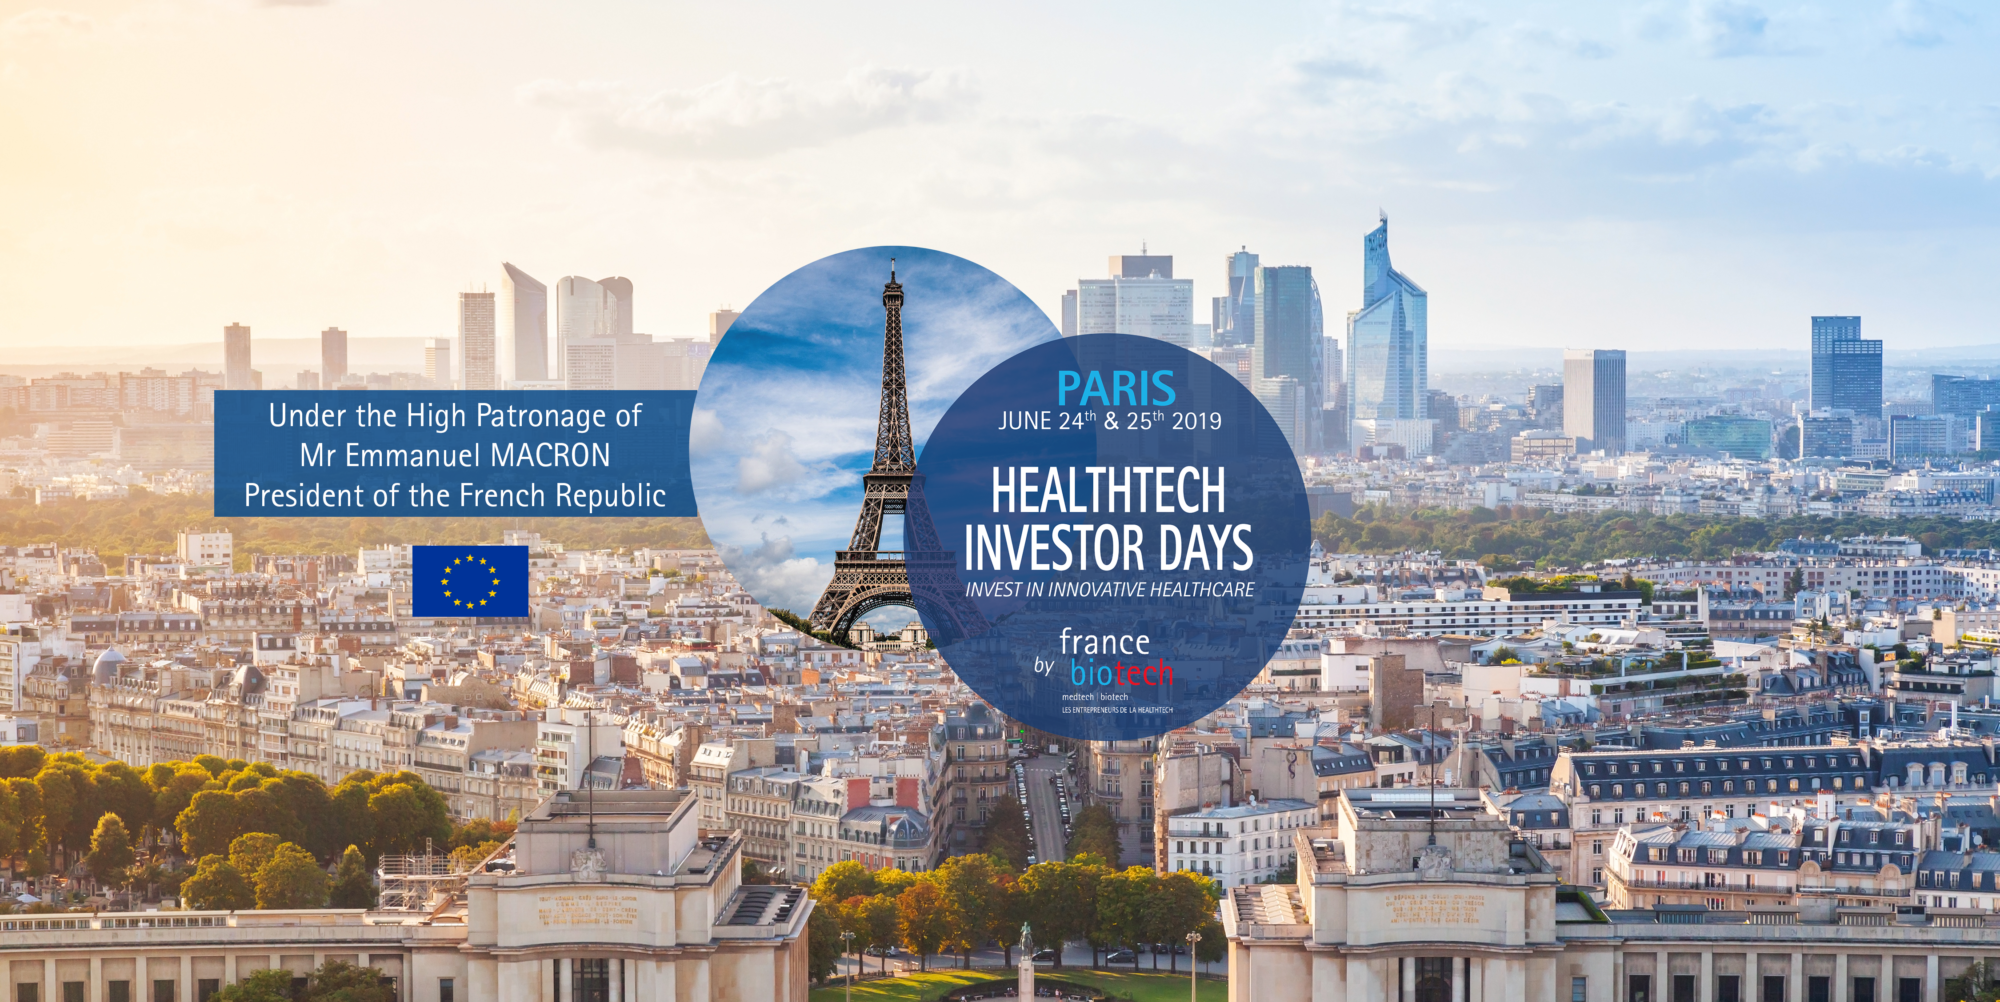 HealthTech Investor Days